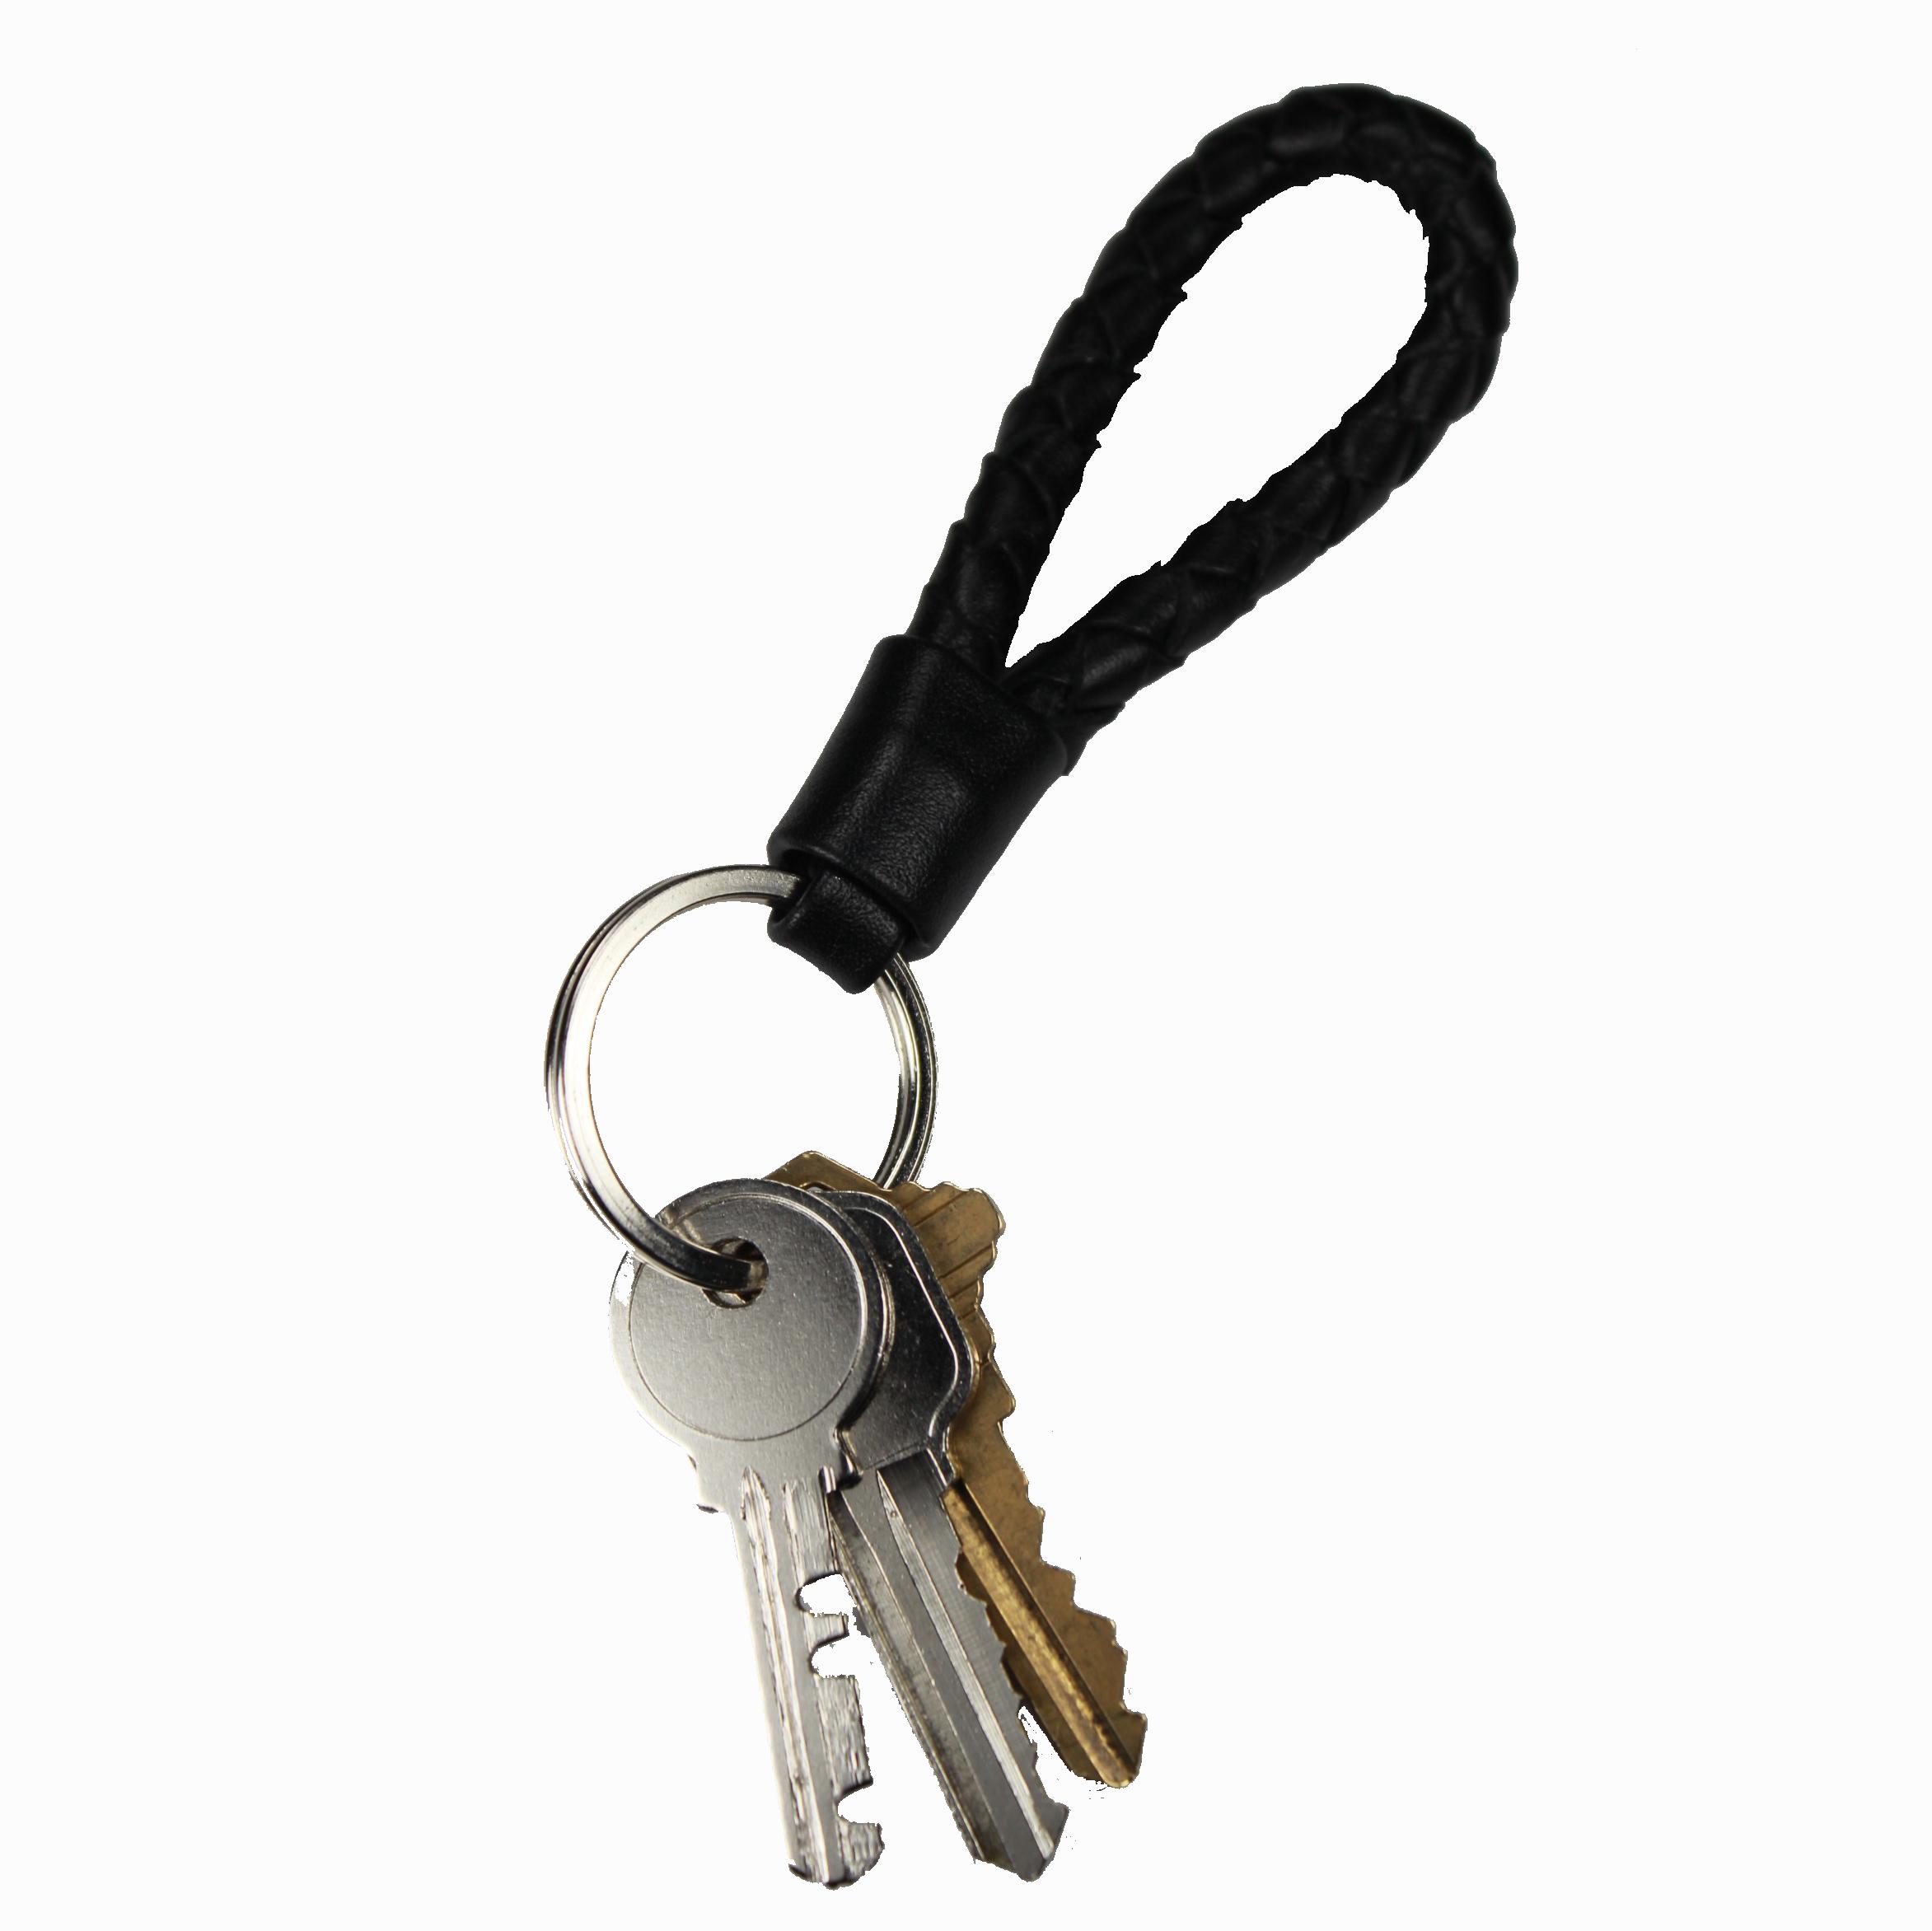 final key chain 1.jpg